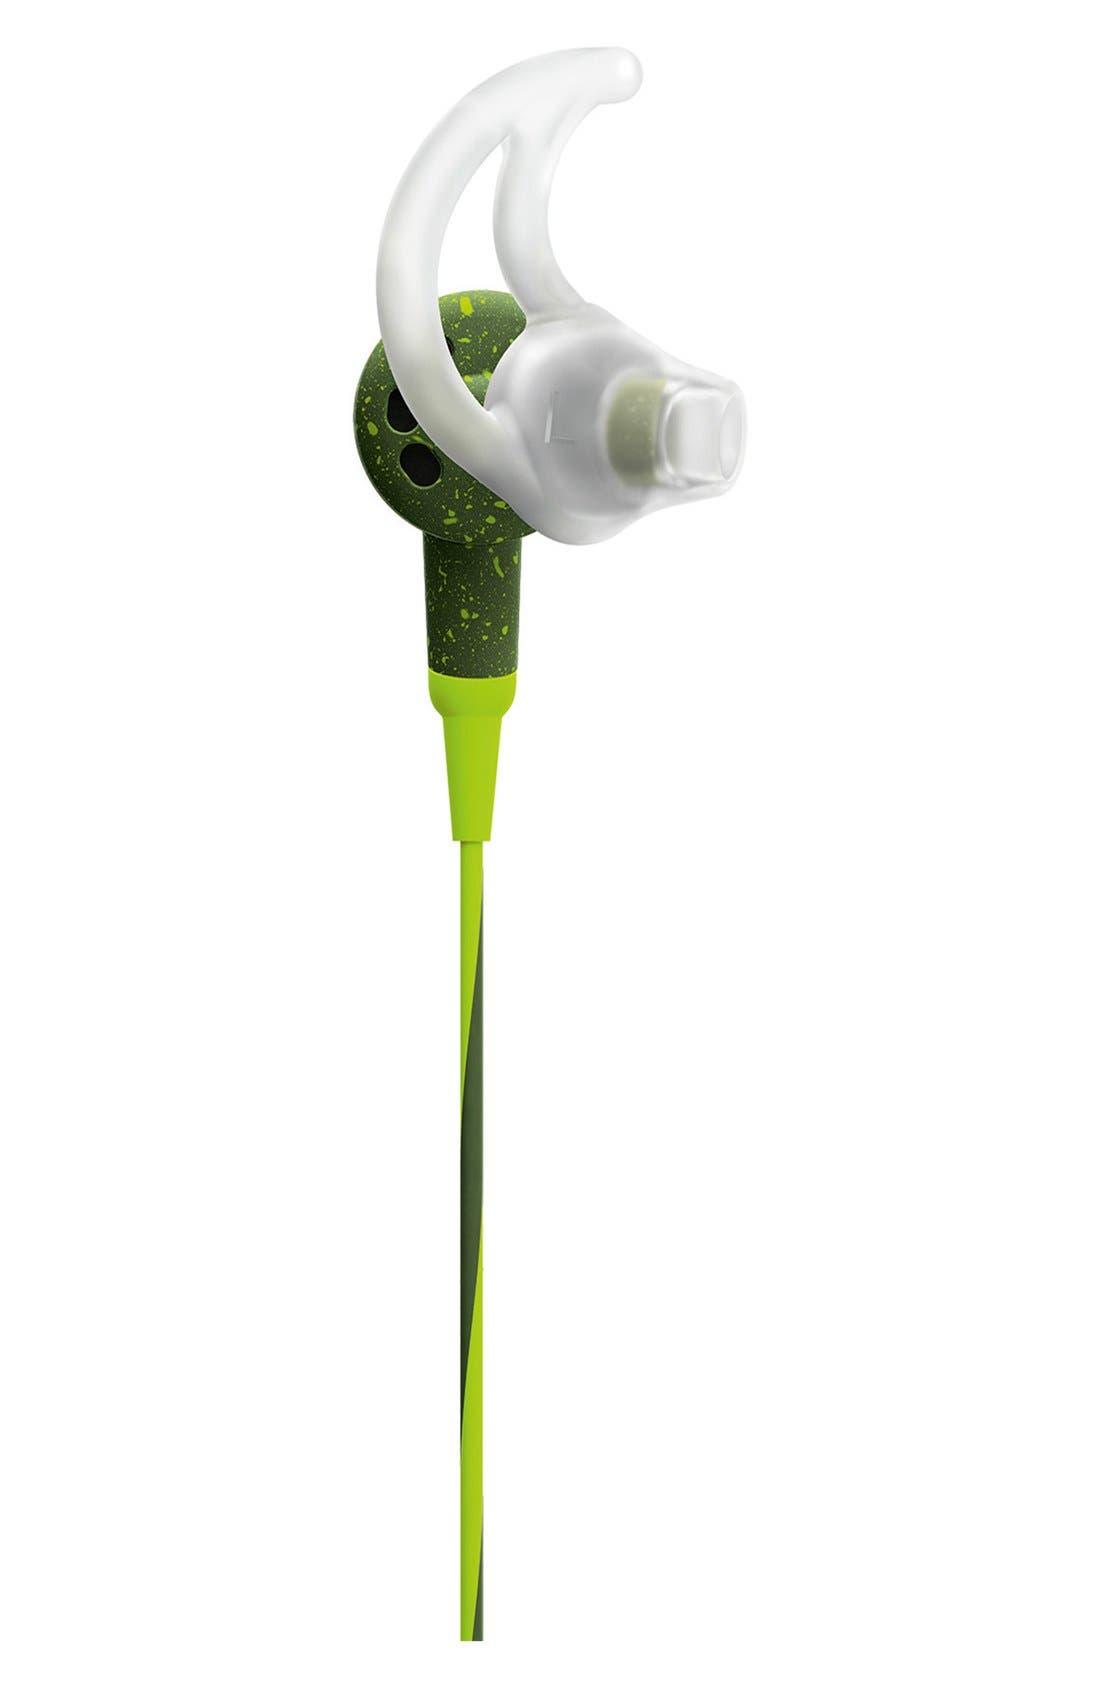 SoundSport<sup>®</sup> In-Ear Headphones,                             Alternate thumbnail 3, color,                             300